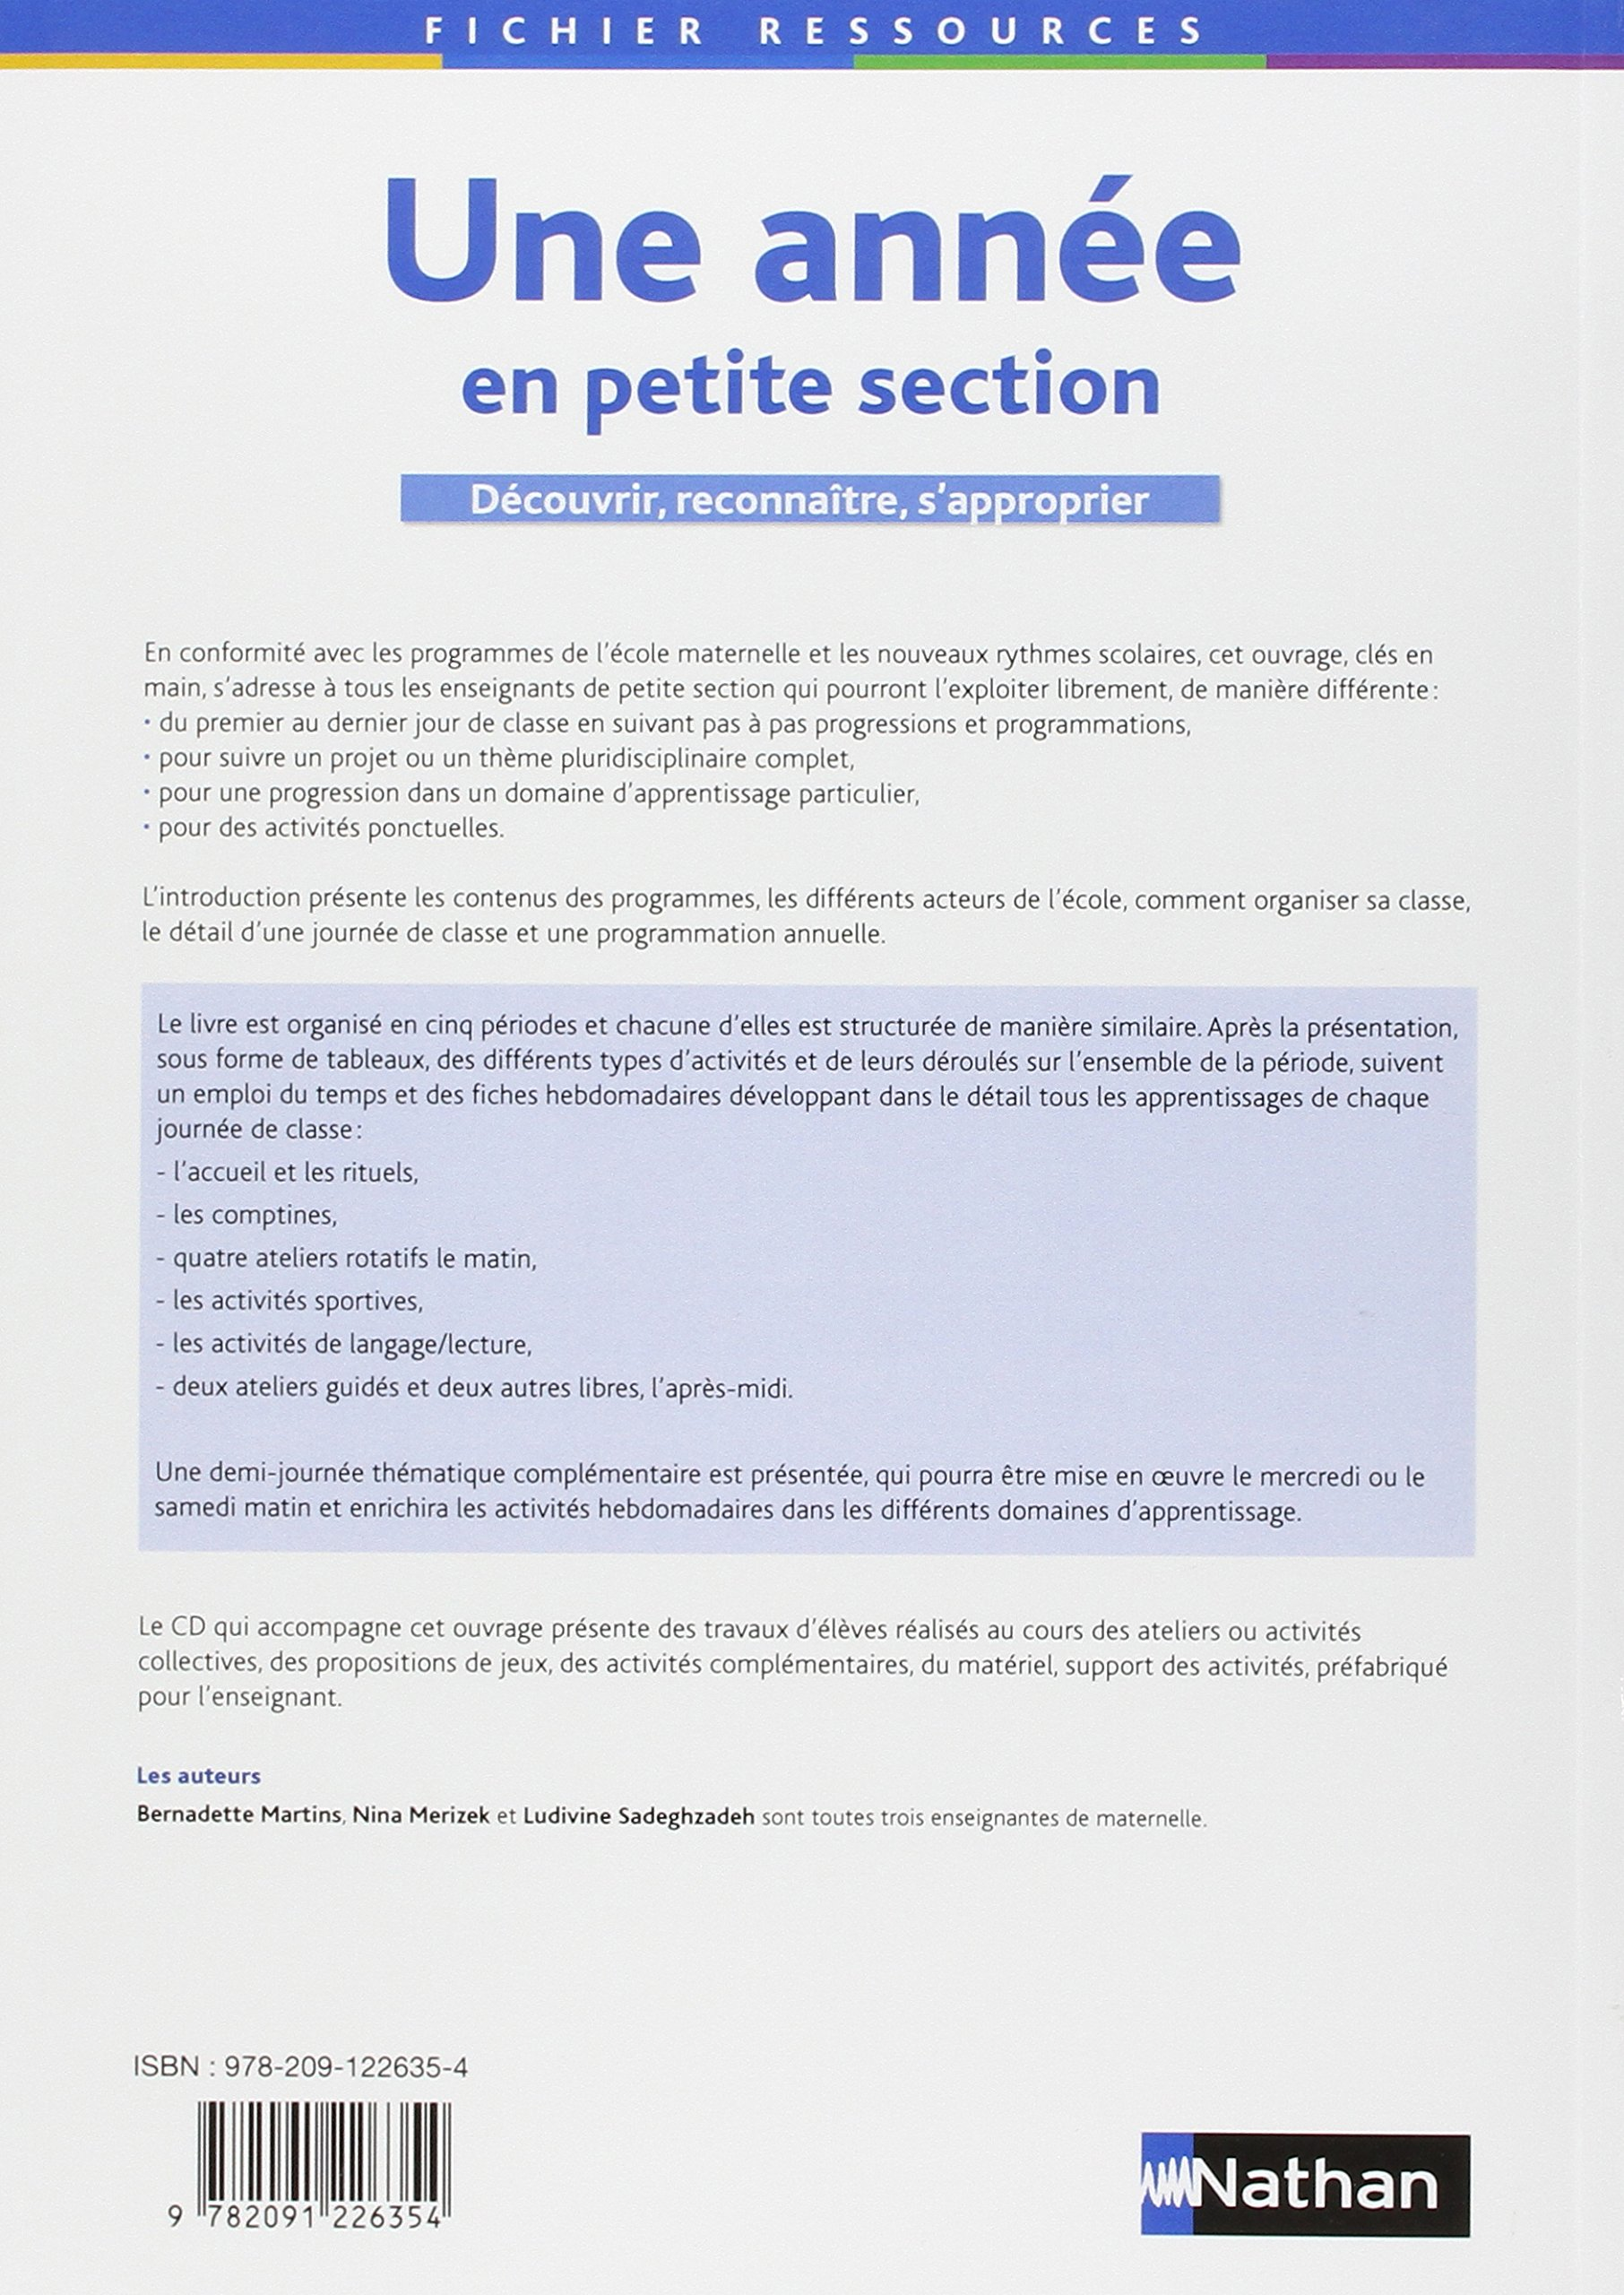 Une année en petite section: Amazon.fr: Bernadette Martins, Nina Mérizek,  Ludivine Sadeghzadeh: Livres